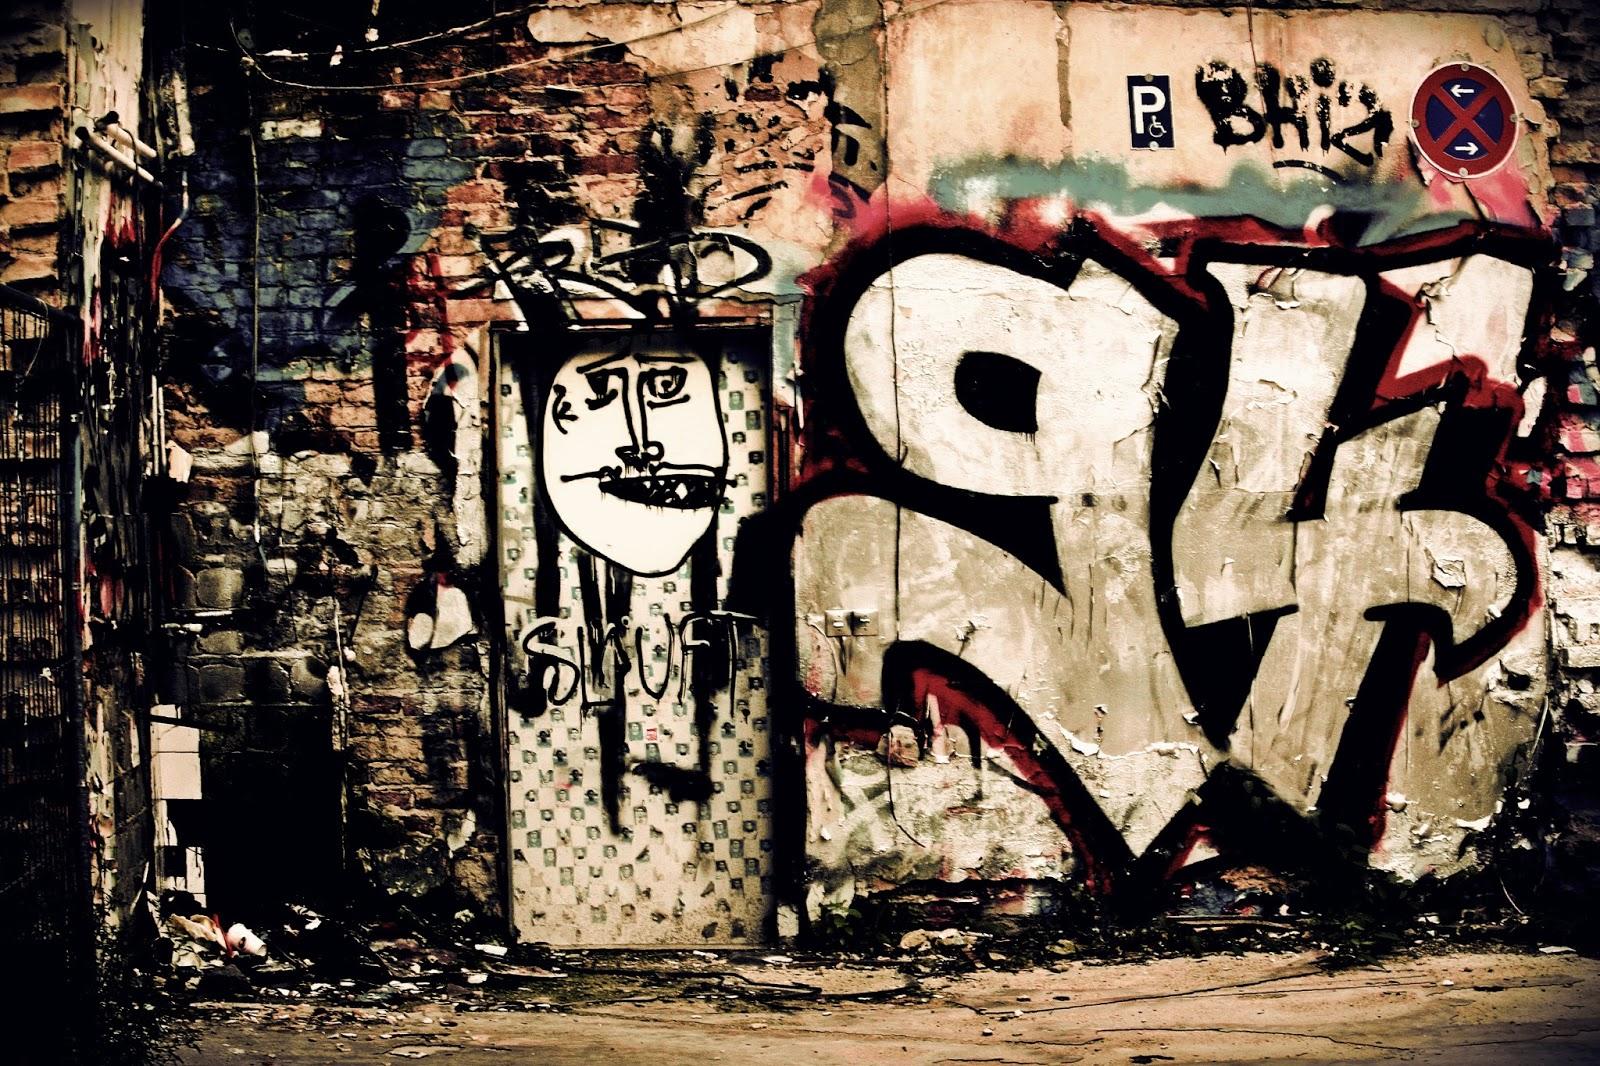 Tiger Shroff Hd Wallpaper Graffiti Photography